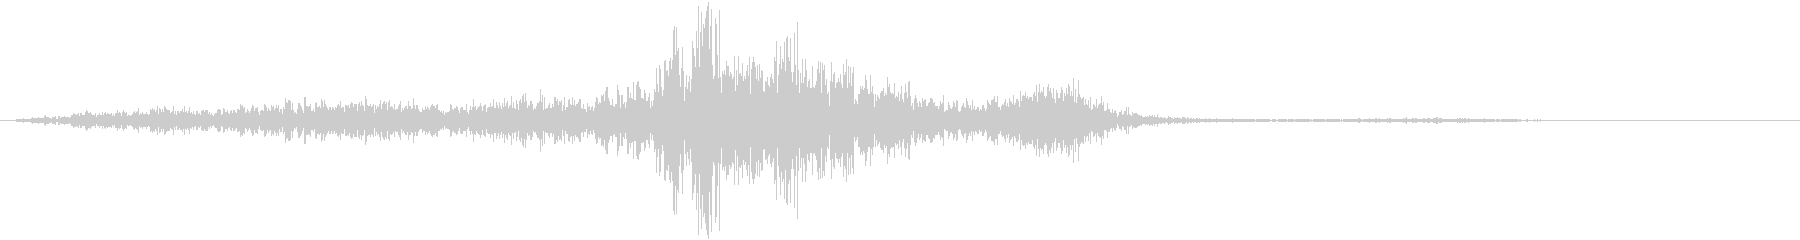 WHOOSHのロークイックランブル1の未再生の波形